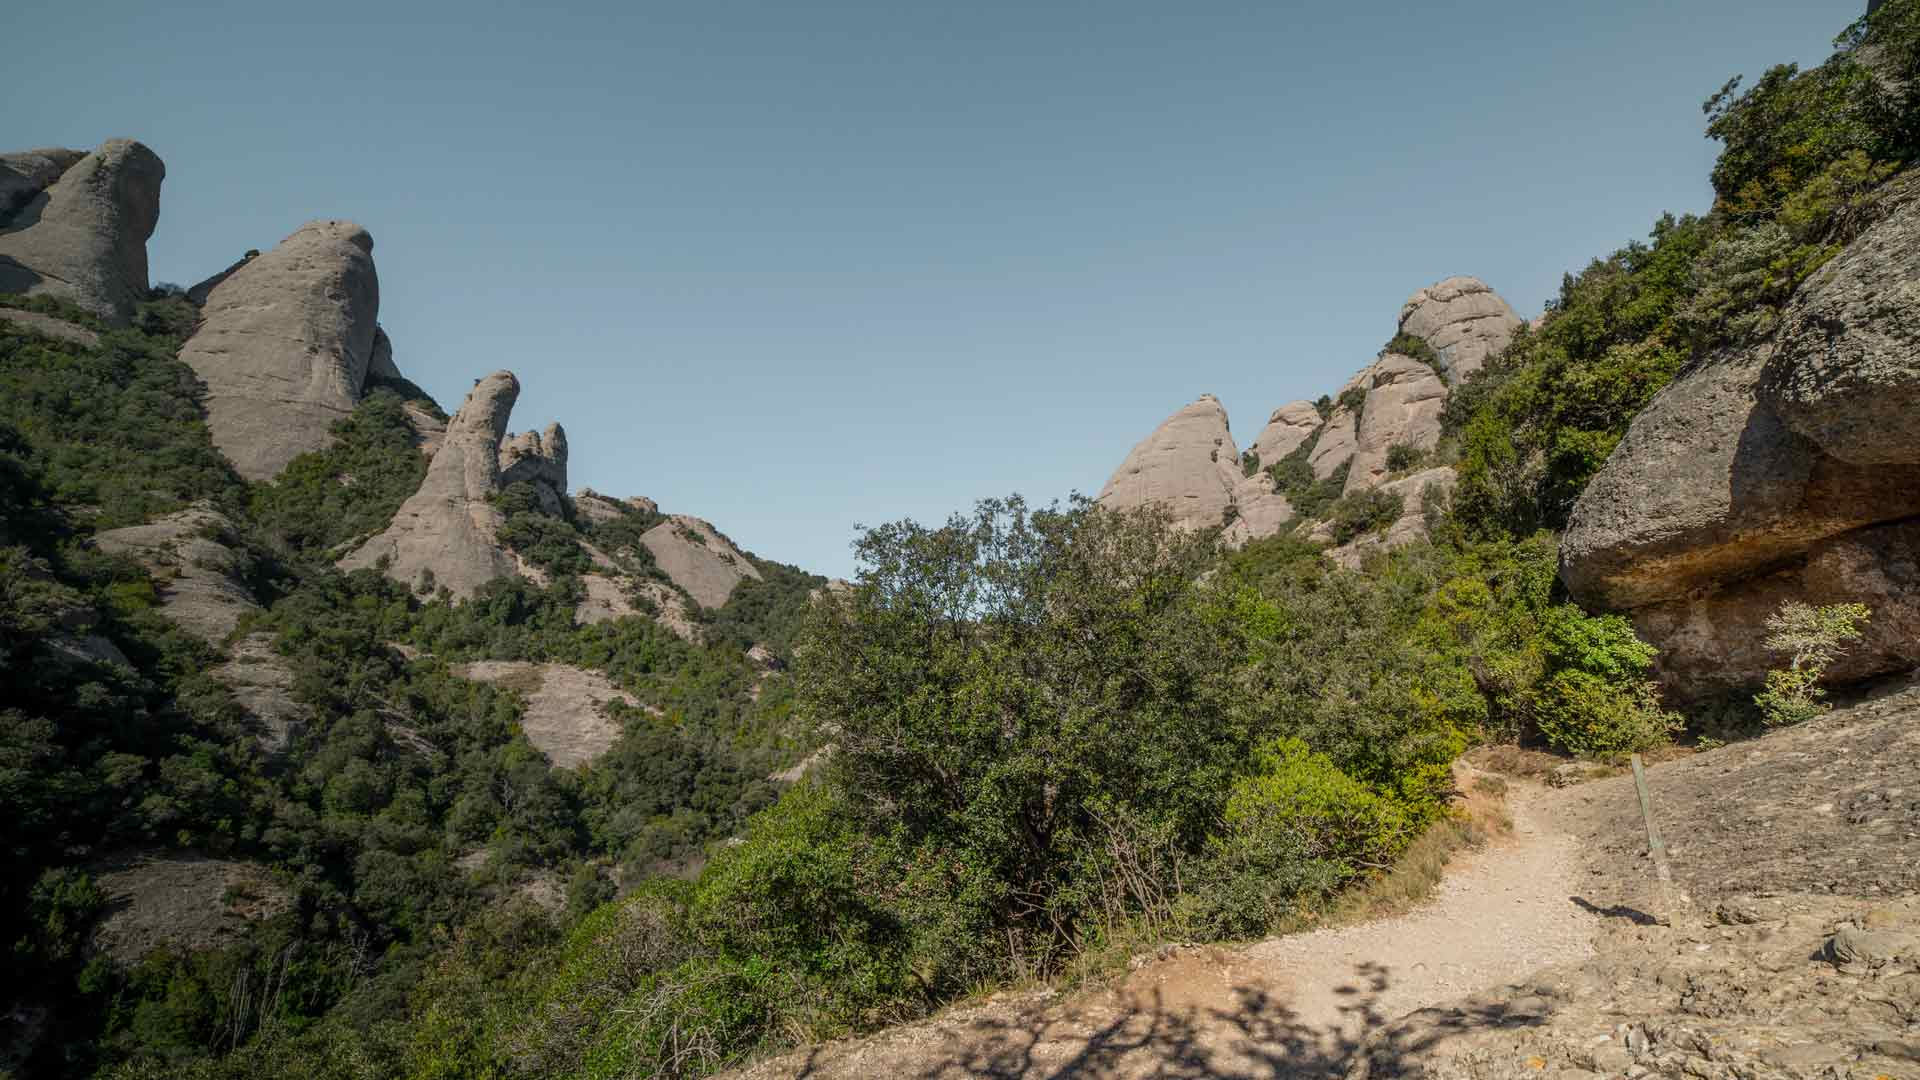 hike-montserrat-path-elefant-sant-jeroni